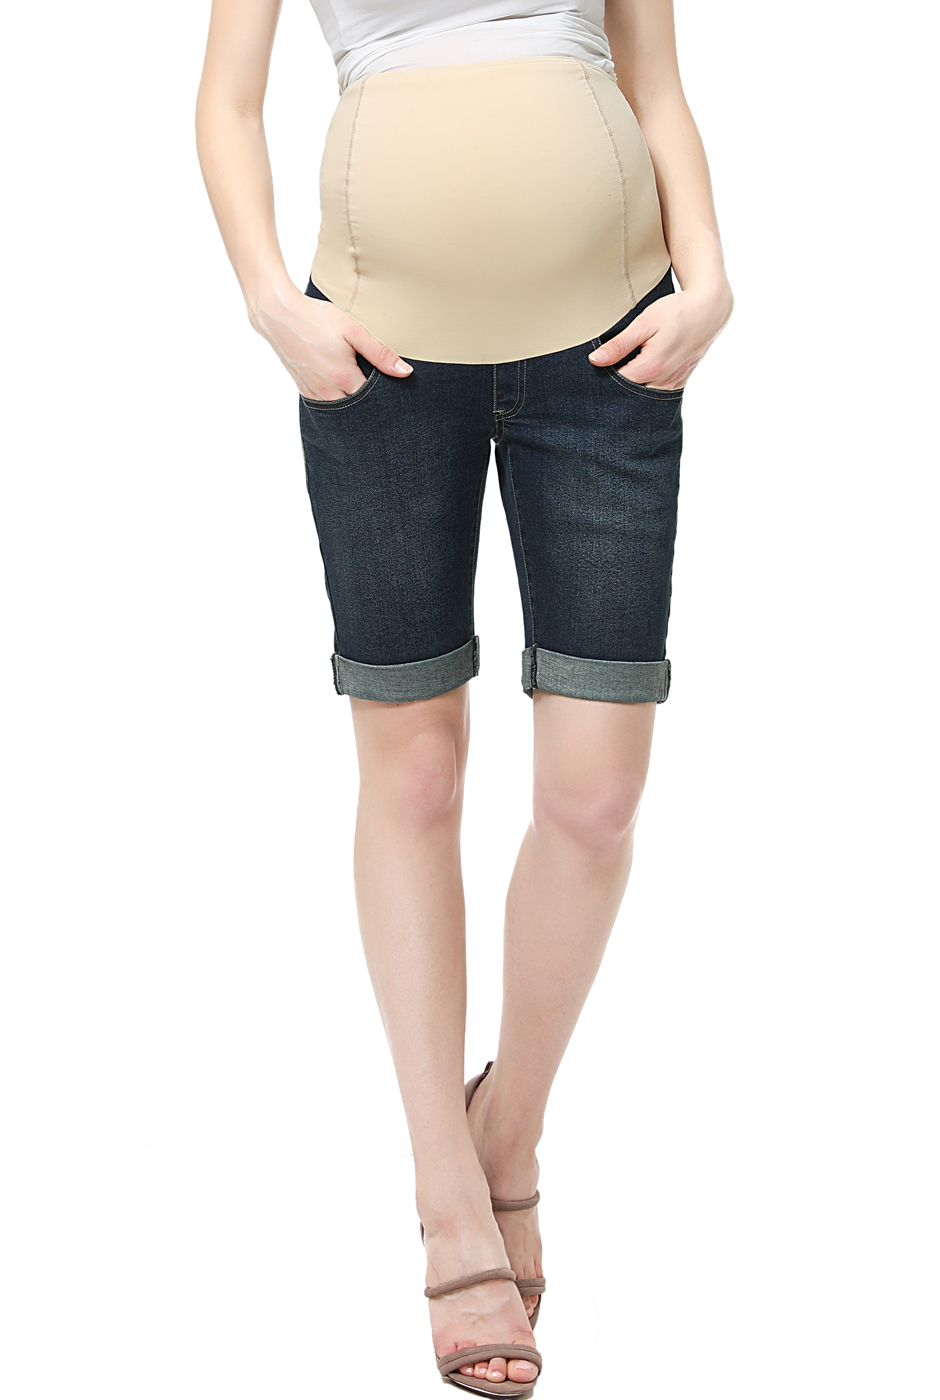 Maternity Women's Denim Shorts